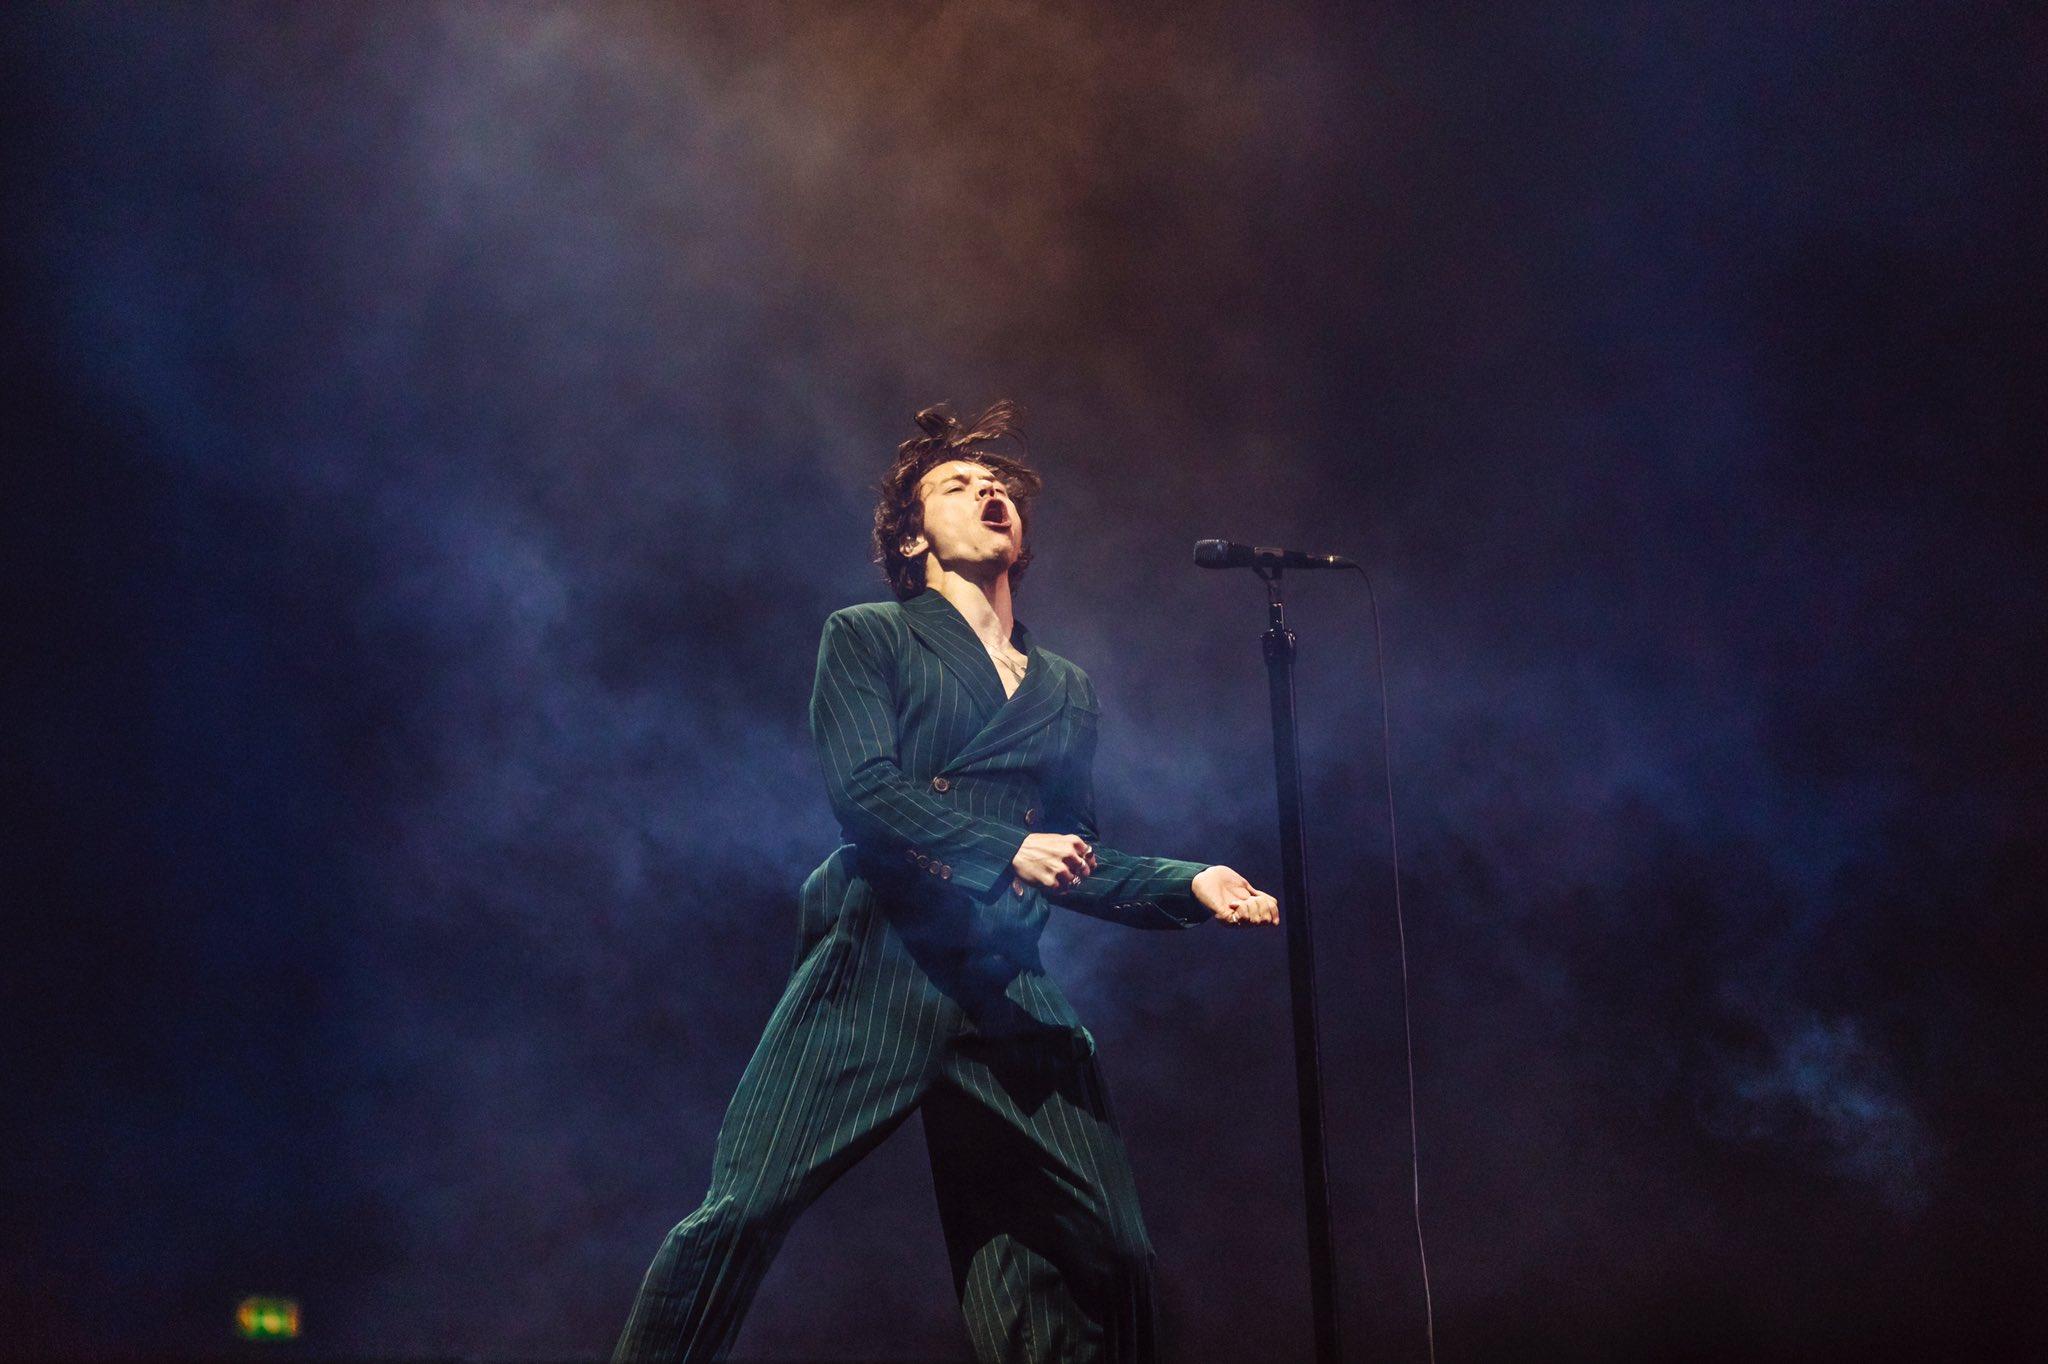 Dublin, Live On Tour. https://t.co/NPUYHMeyUh